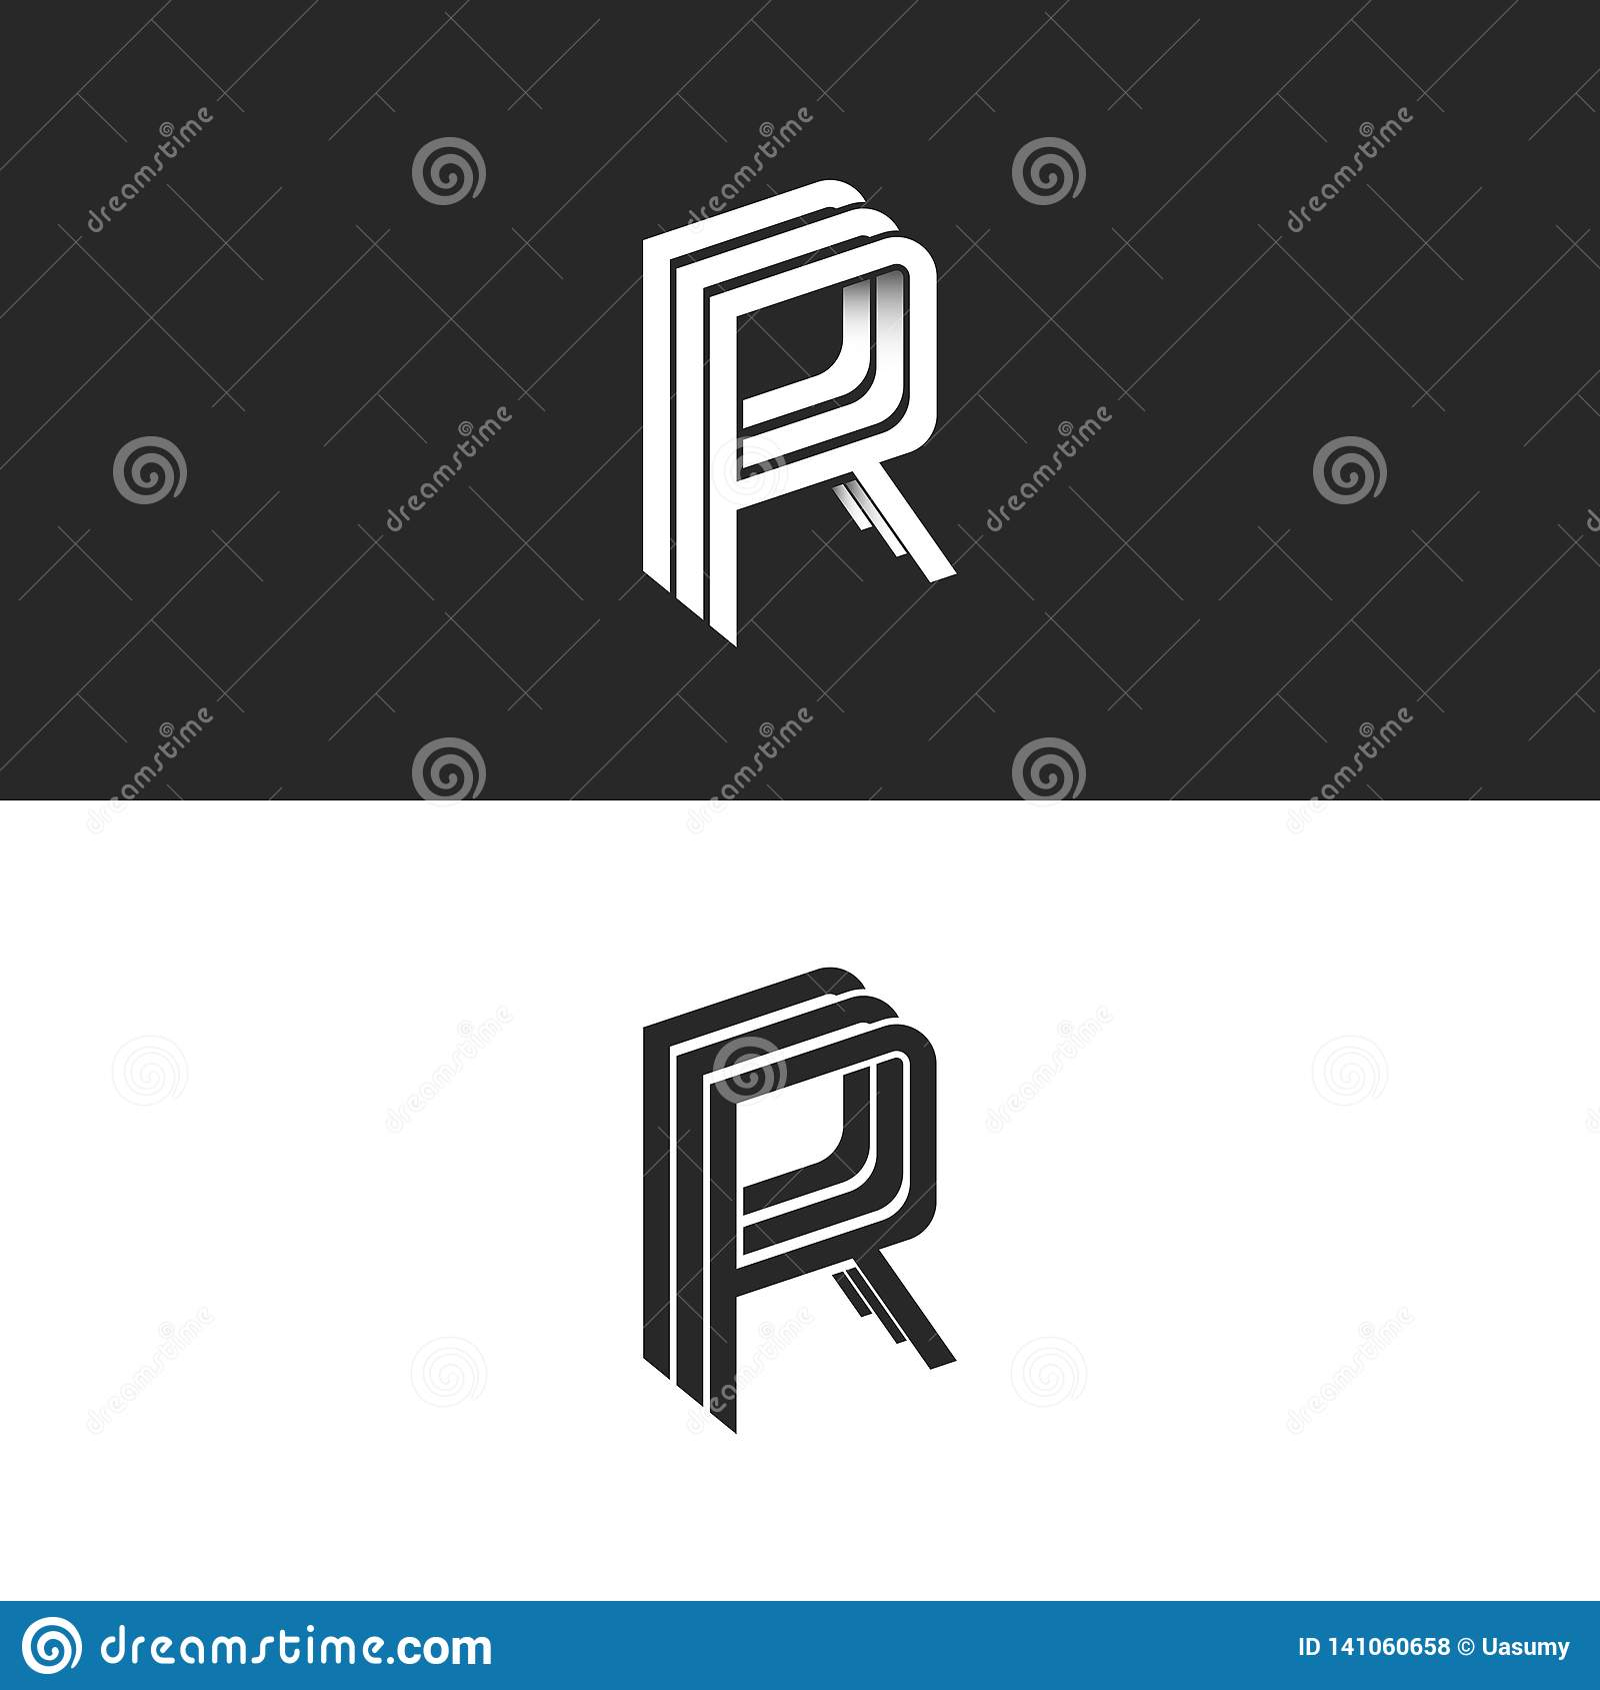 Modelo isométrico do símbolo do emblema RRR do logotipo da letra R, molde preto e branco do elemento do projeto do moderno do mon